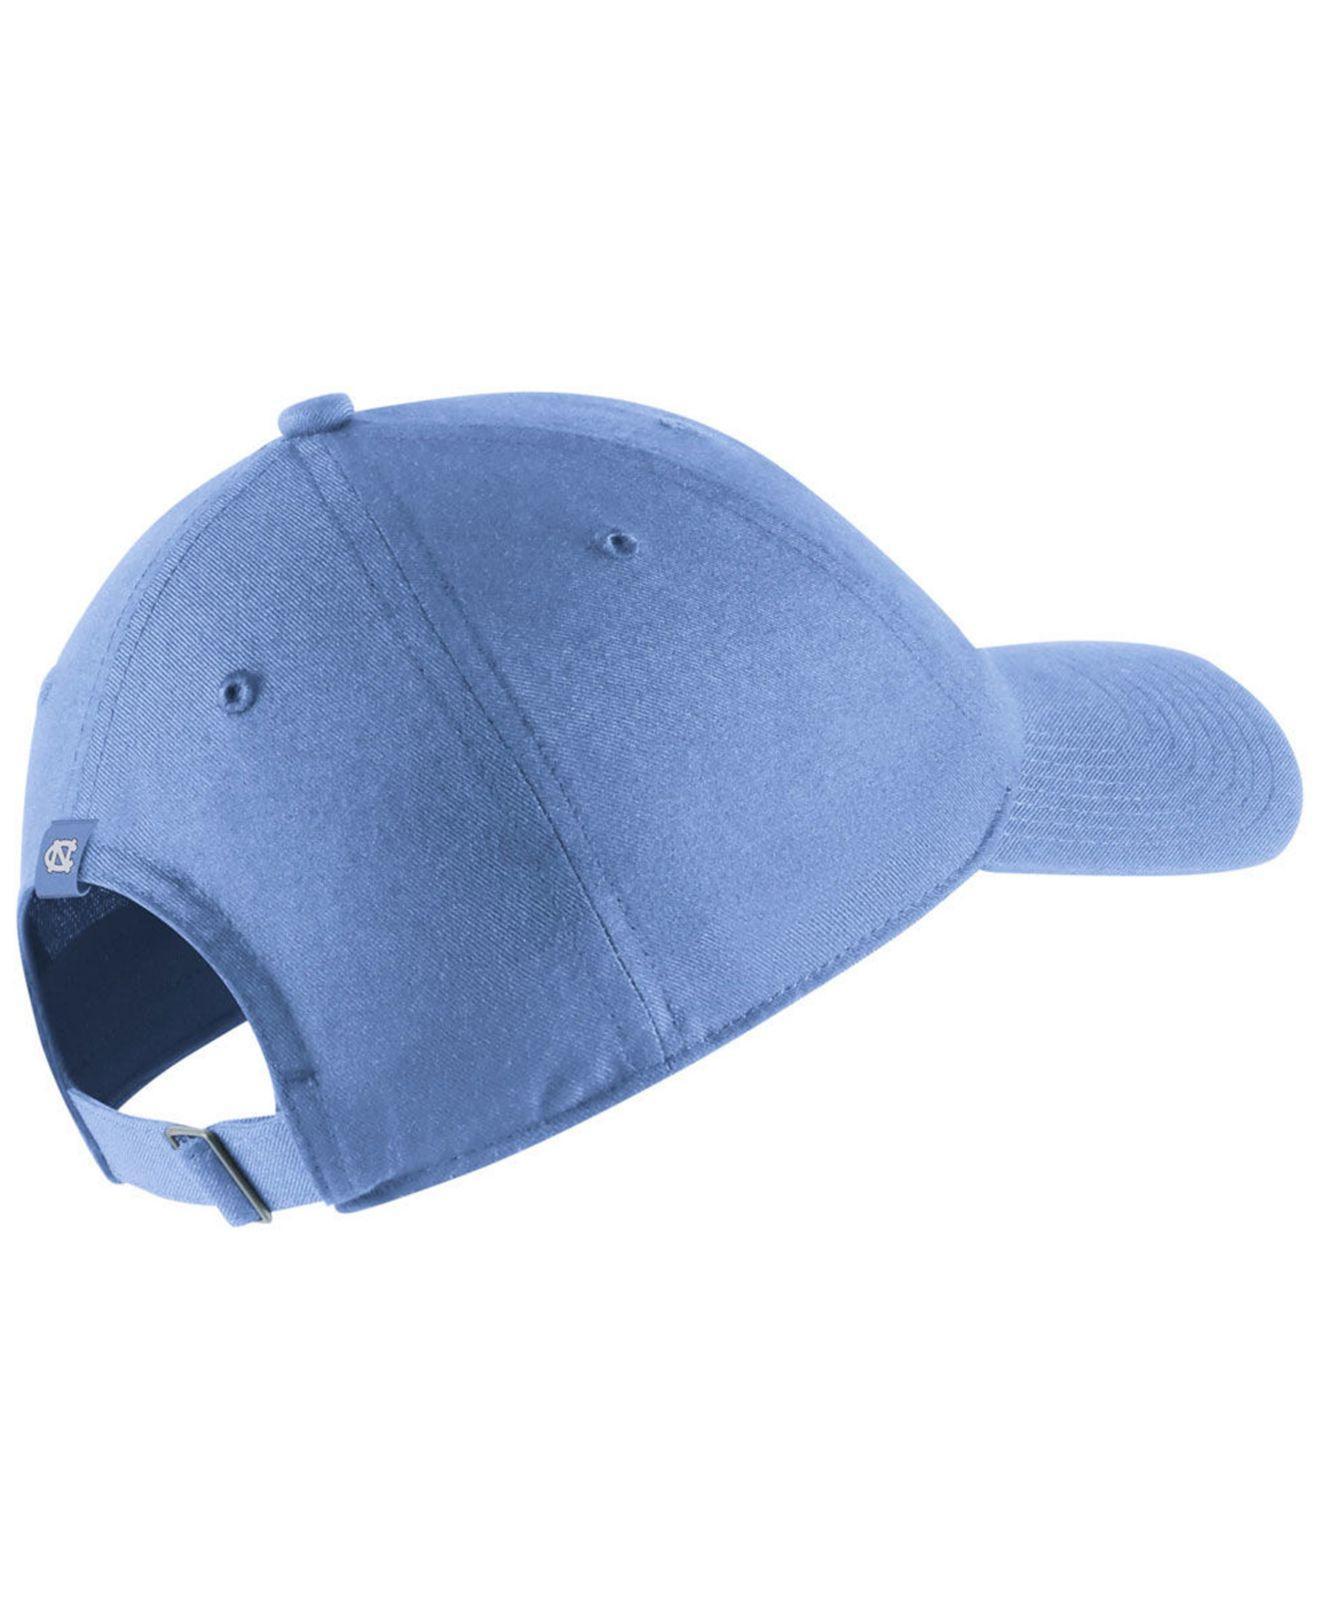 on sale 645fc f8269 Lyst - Nike North Carolina Tar Heels H86 Wordmark Swoosh Cap in Blue for Men